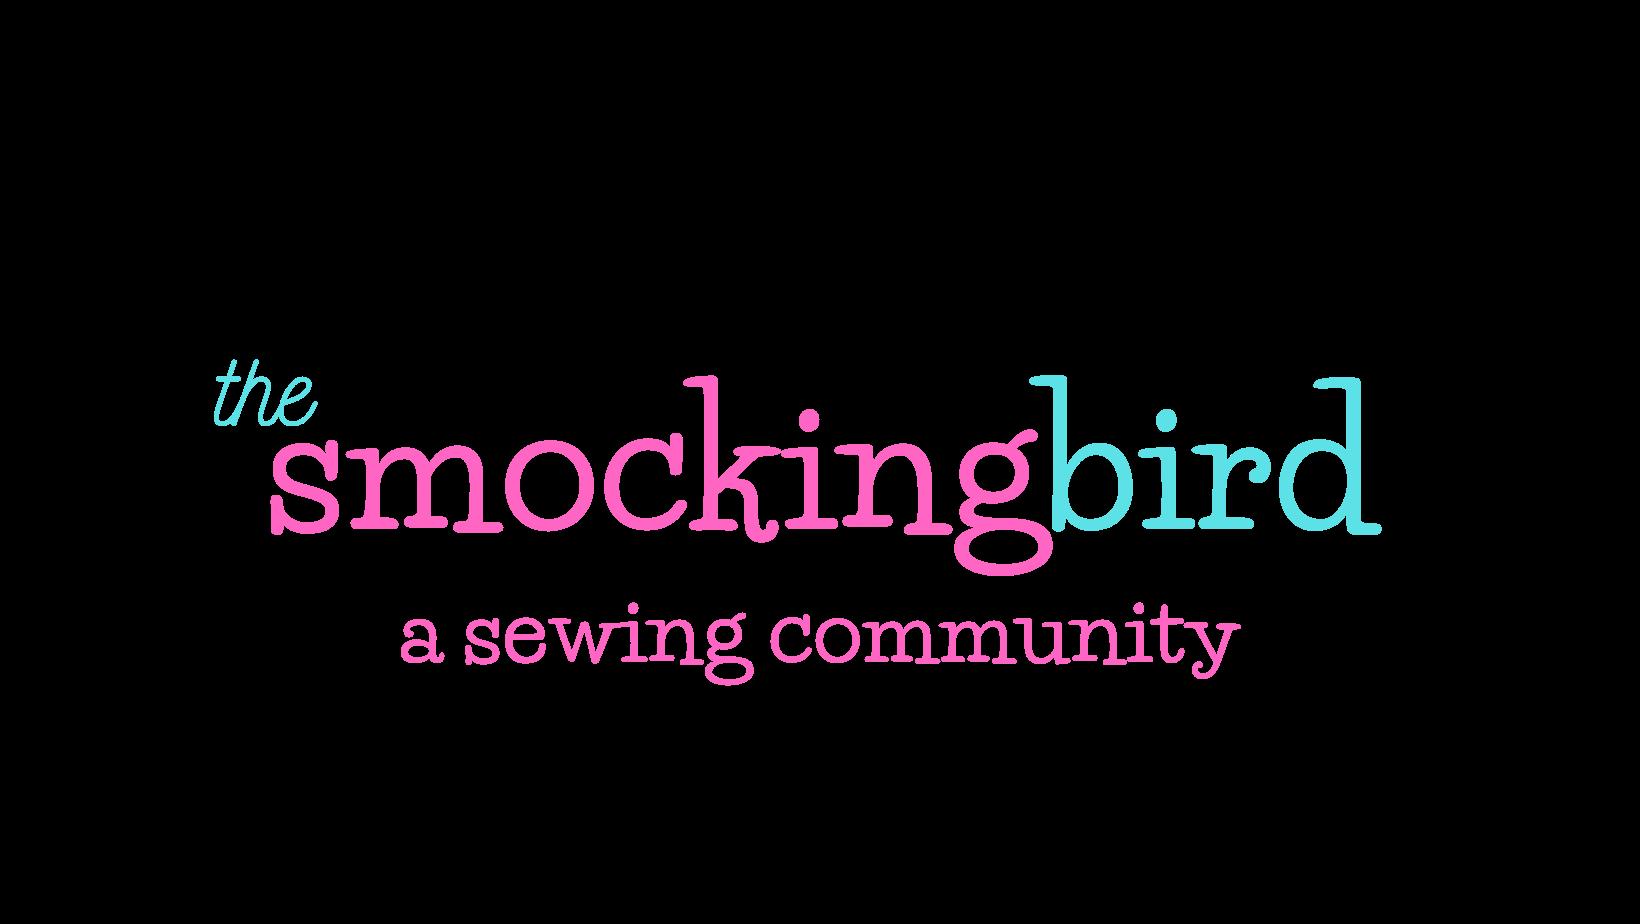 The Smocking Bird